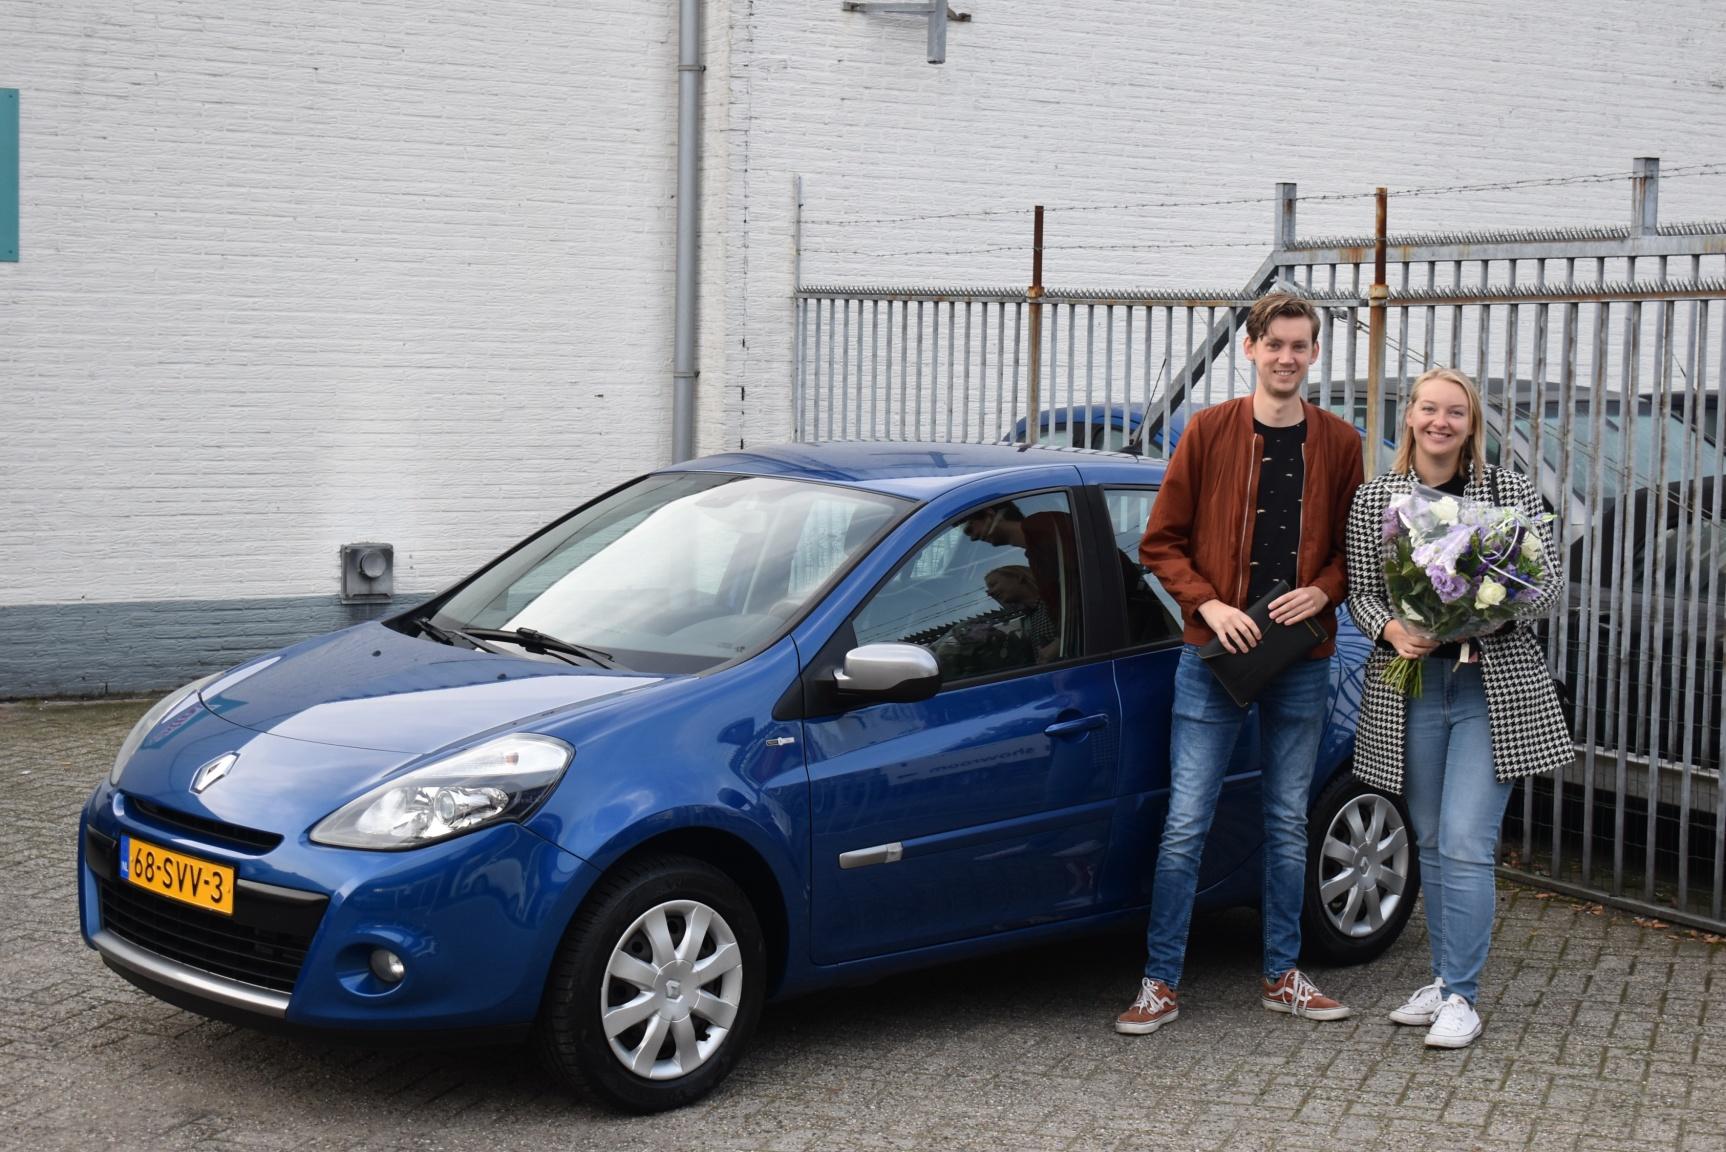 Aflevering Renault Clio-2021-09-15 06:50:55